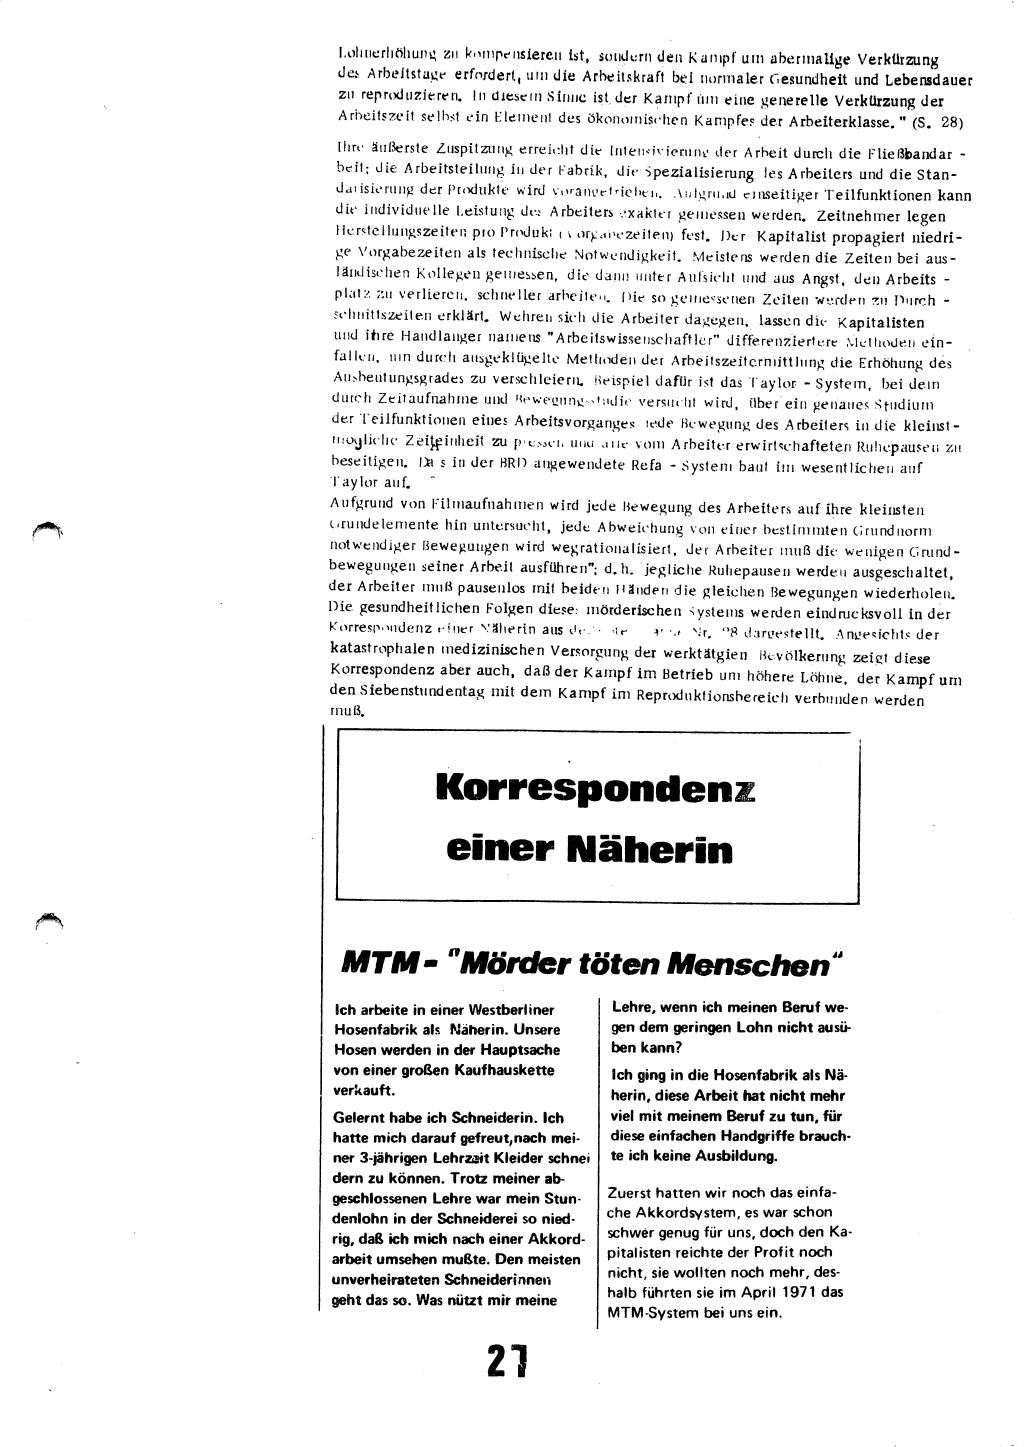 KSV_Grundschulung_1975_01_40